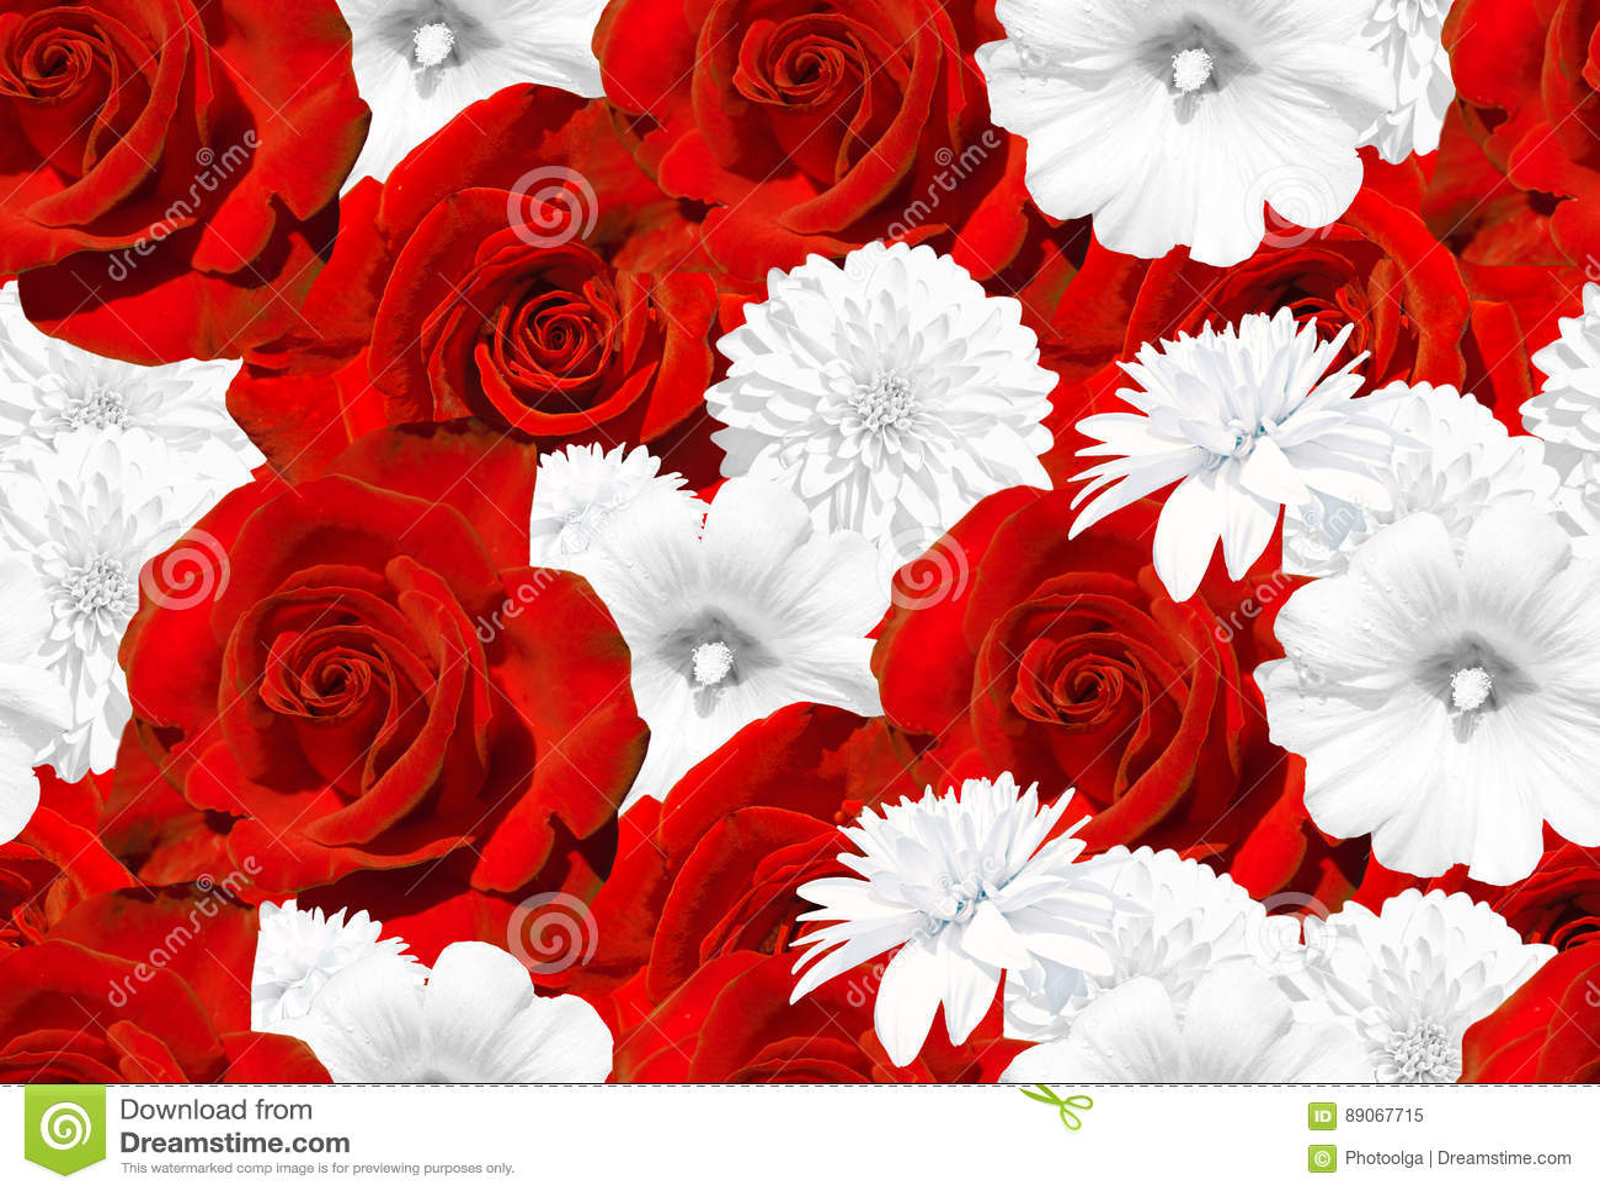 Textura Inconsútil De La Flor Rosas Rojas Y Flores Blancas Rose